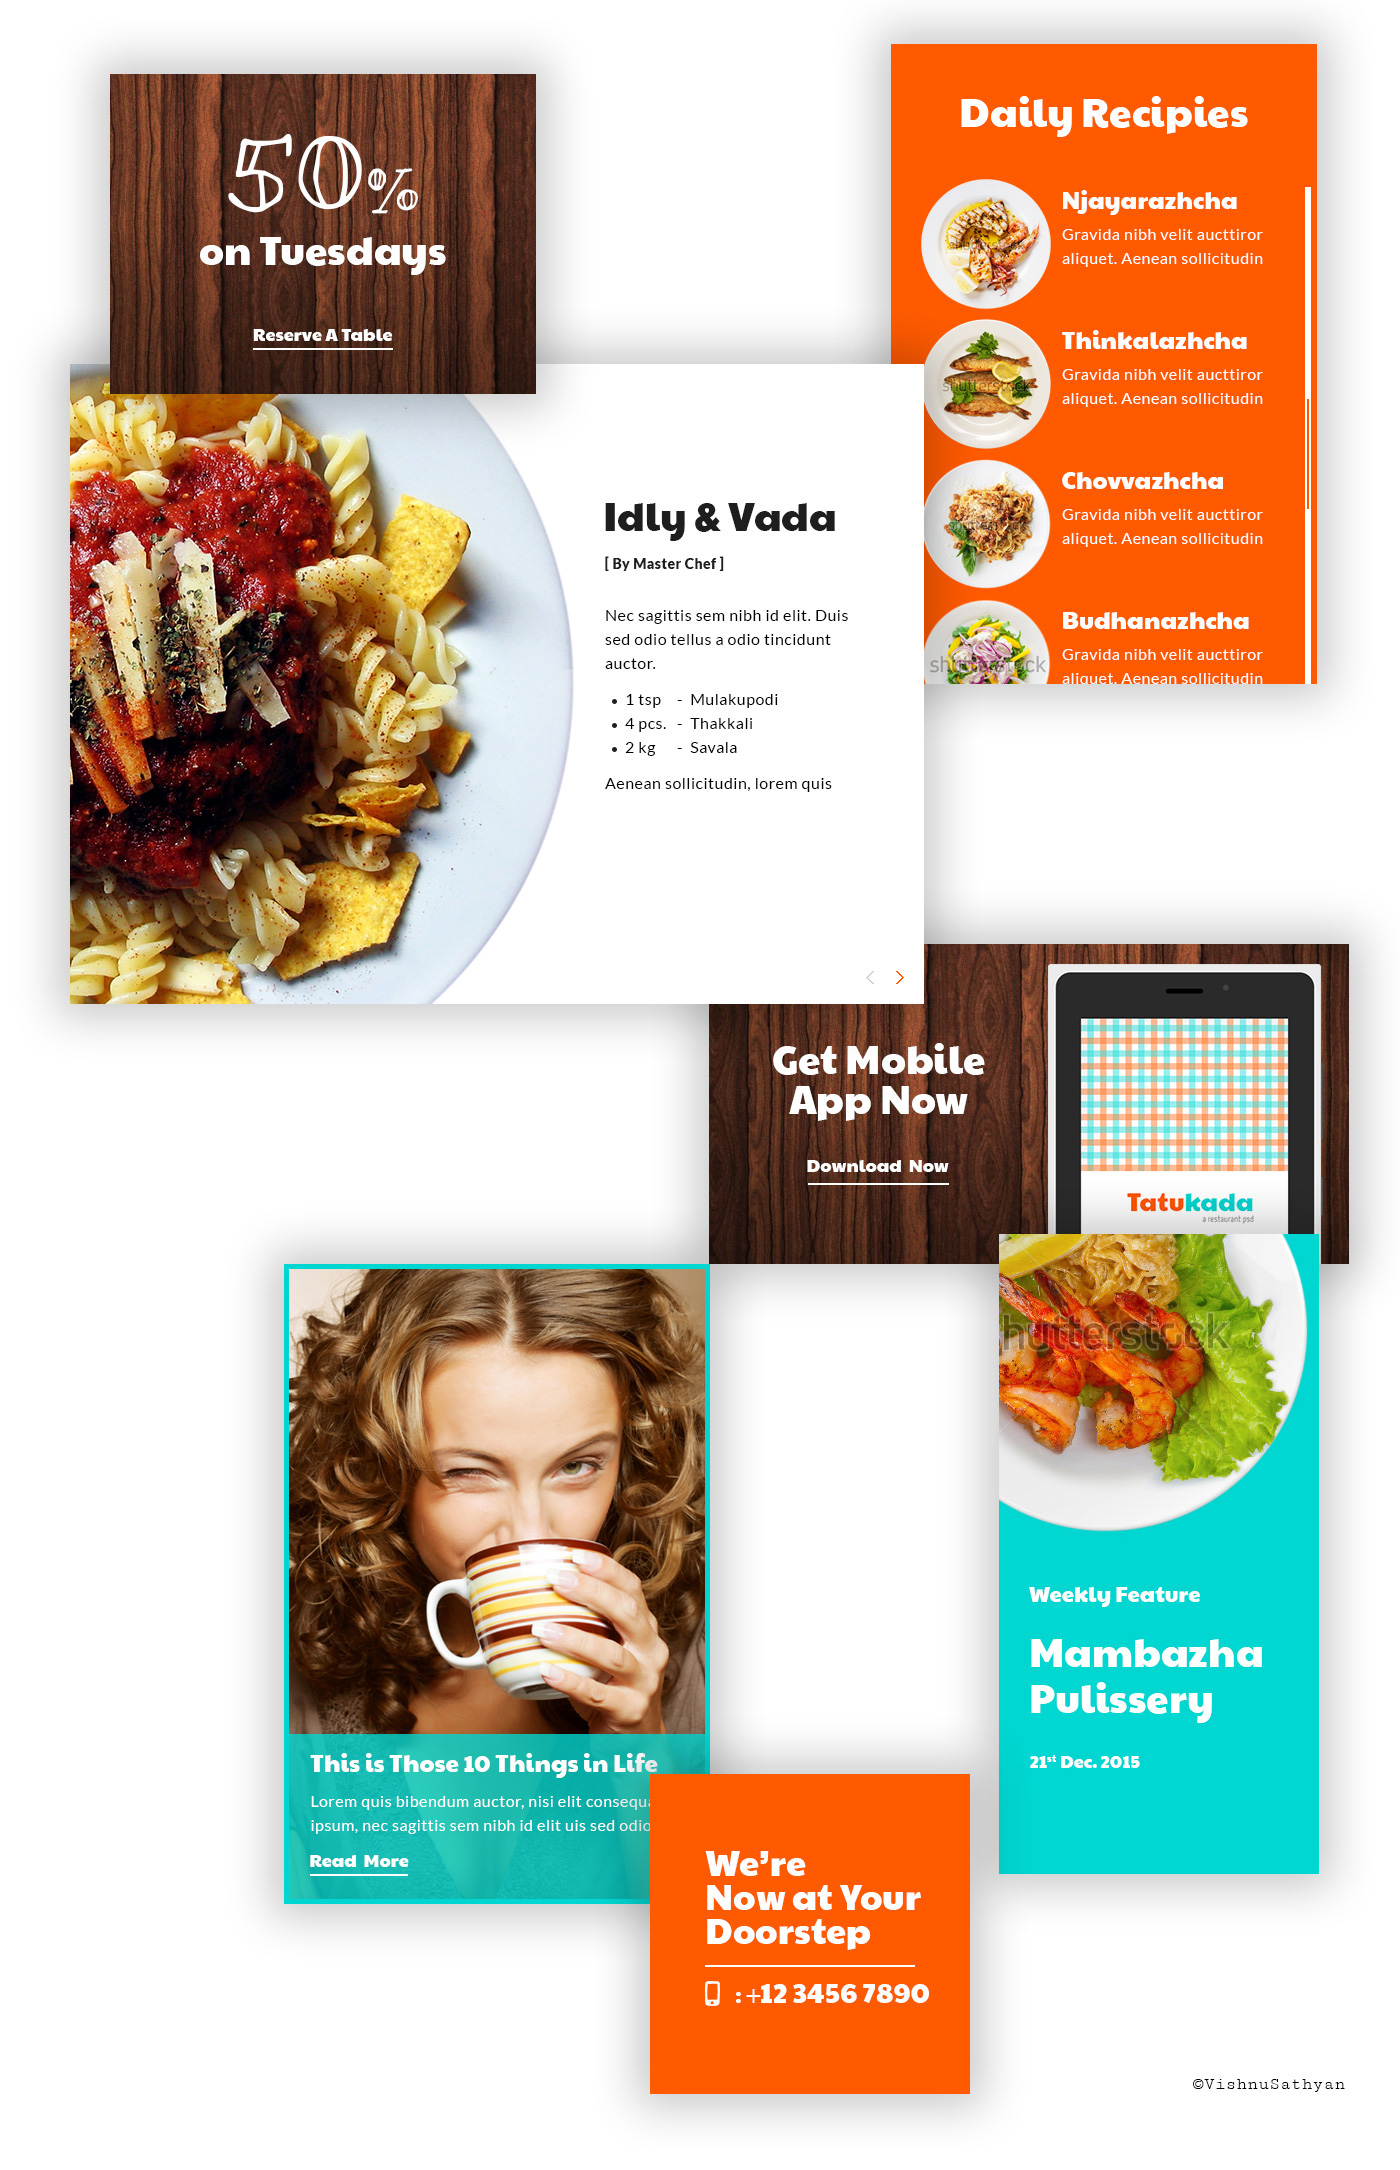 freebie free psd Website template tatukada tattukada vishnusathyan restaurant hotel Food  eat foodie